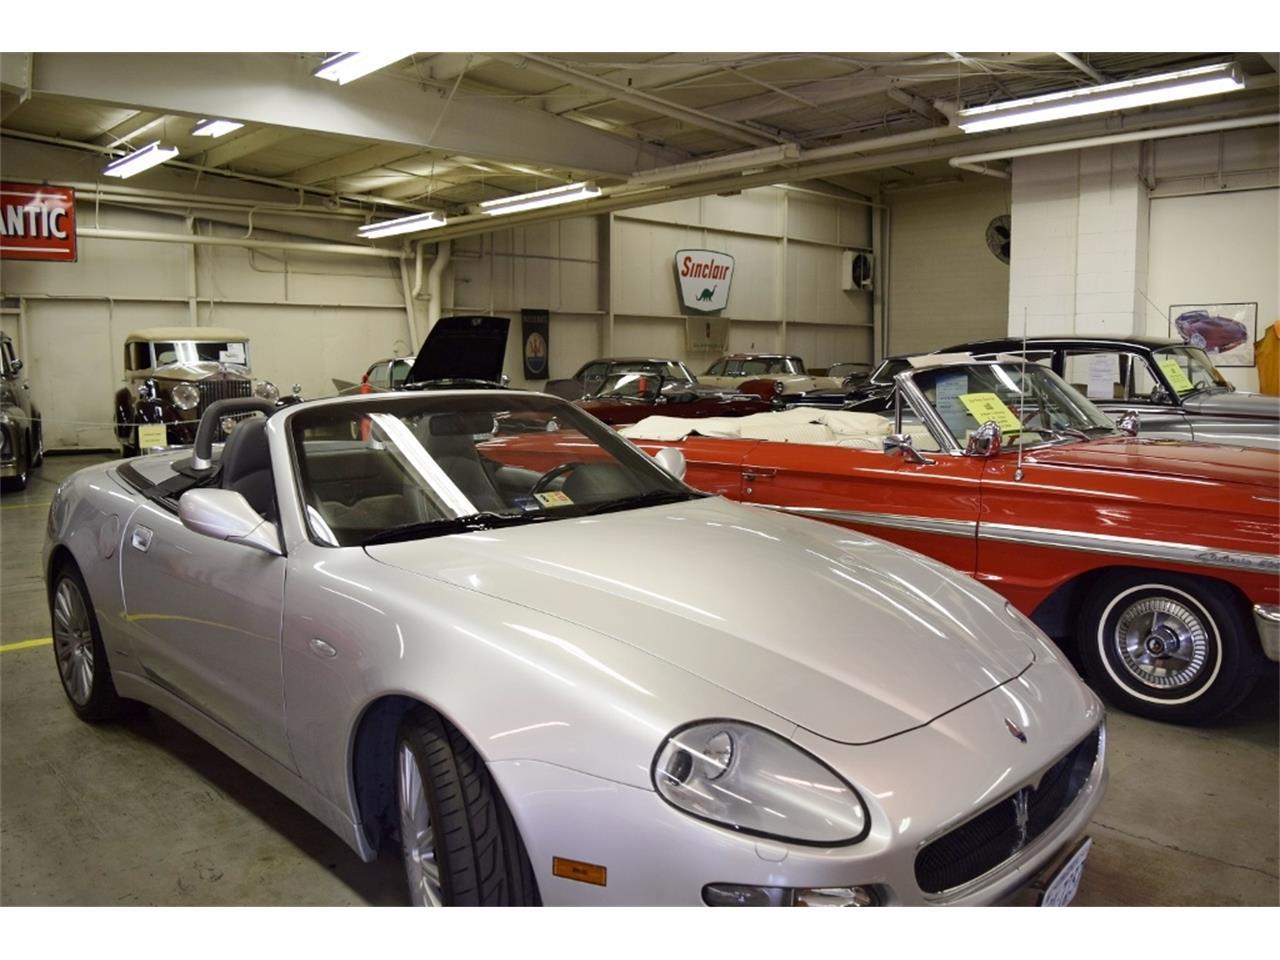 2002 Maserati Spyder for Sale   ClassicCars.com   CC-979038